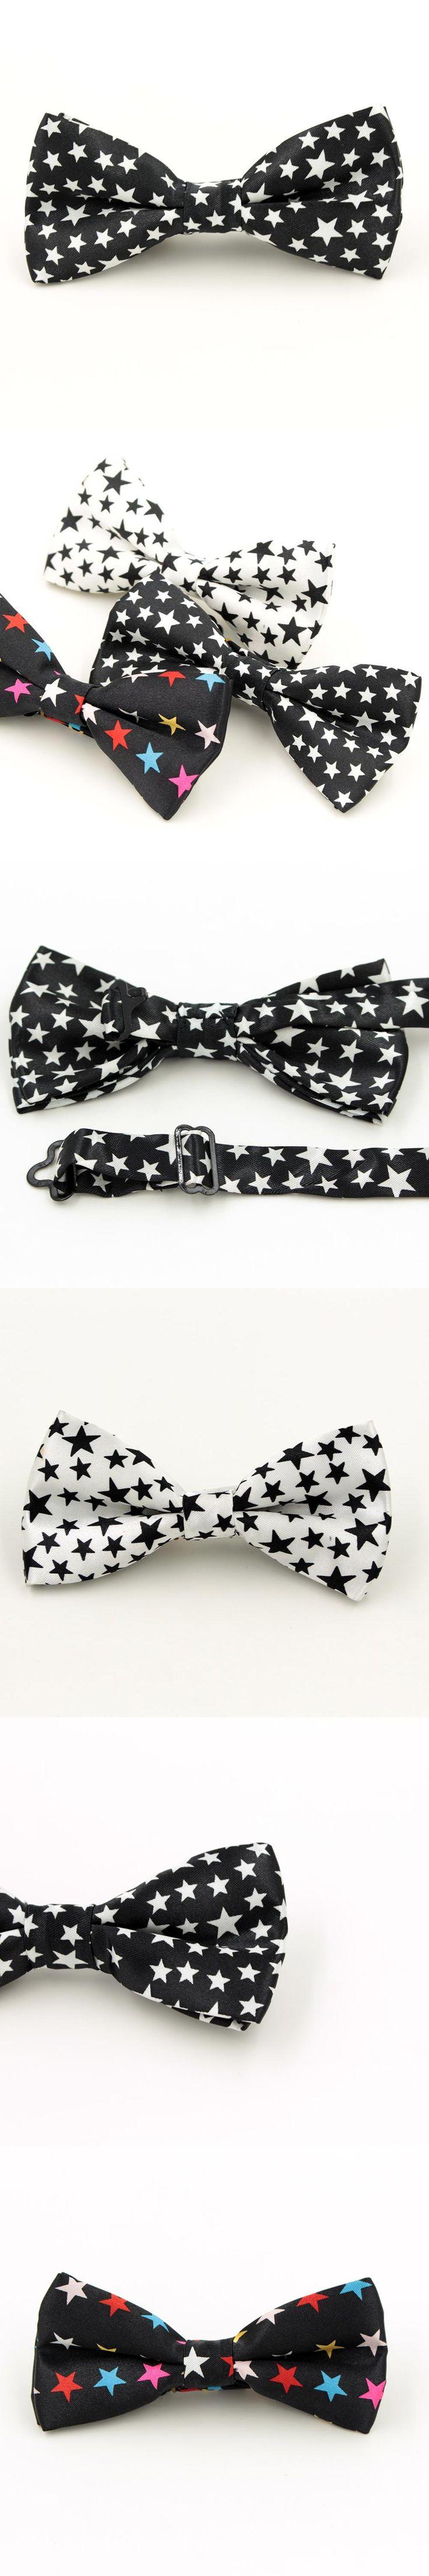 1 piece Fashion Men's Bow tie Printing Stars Bowtie Leisure Butterfly For Men Wedding Marriage Grooms Cravat tie